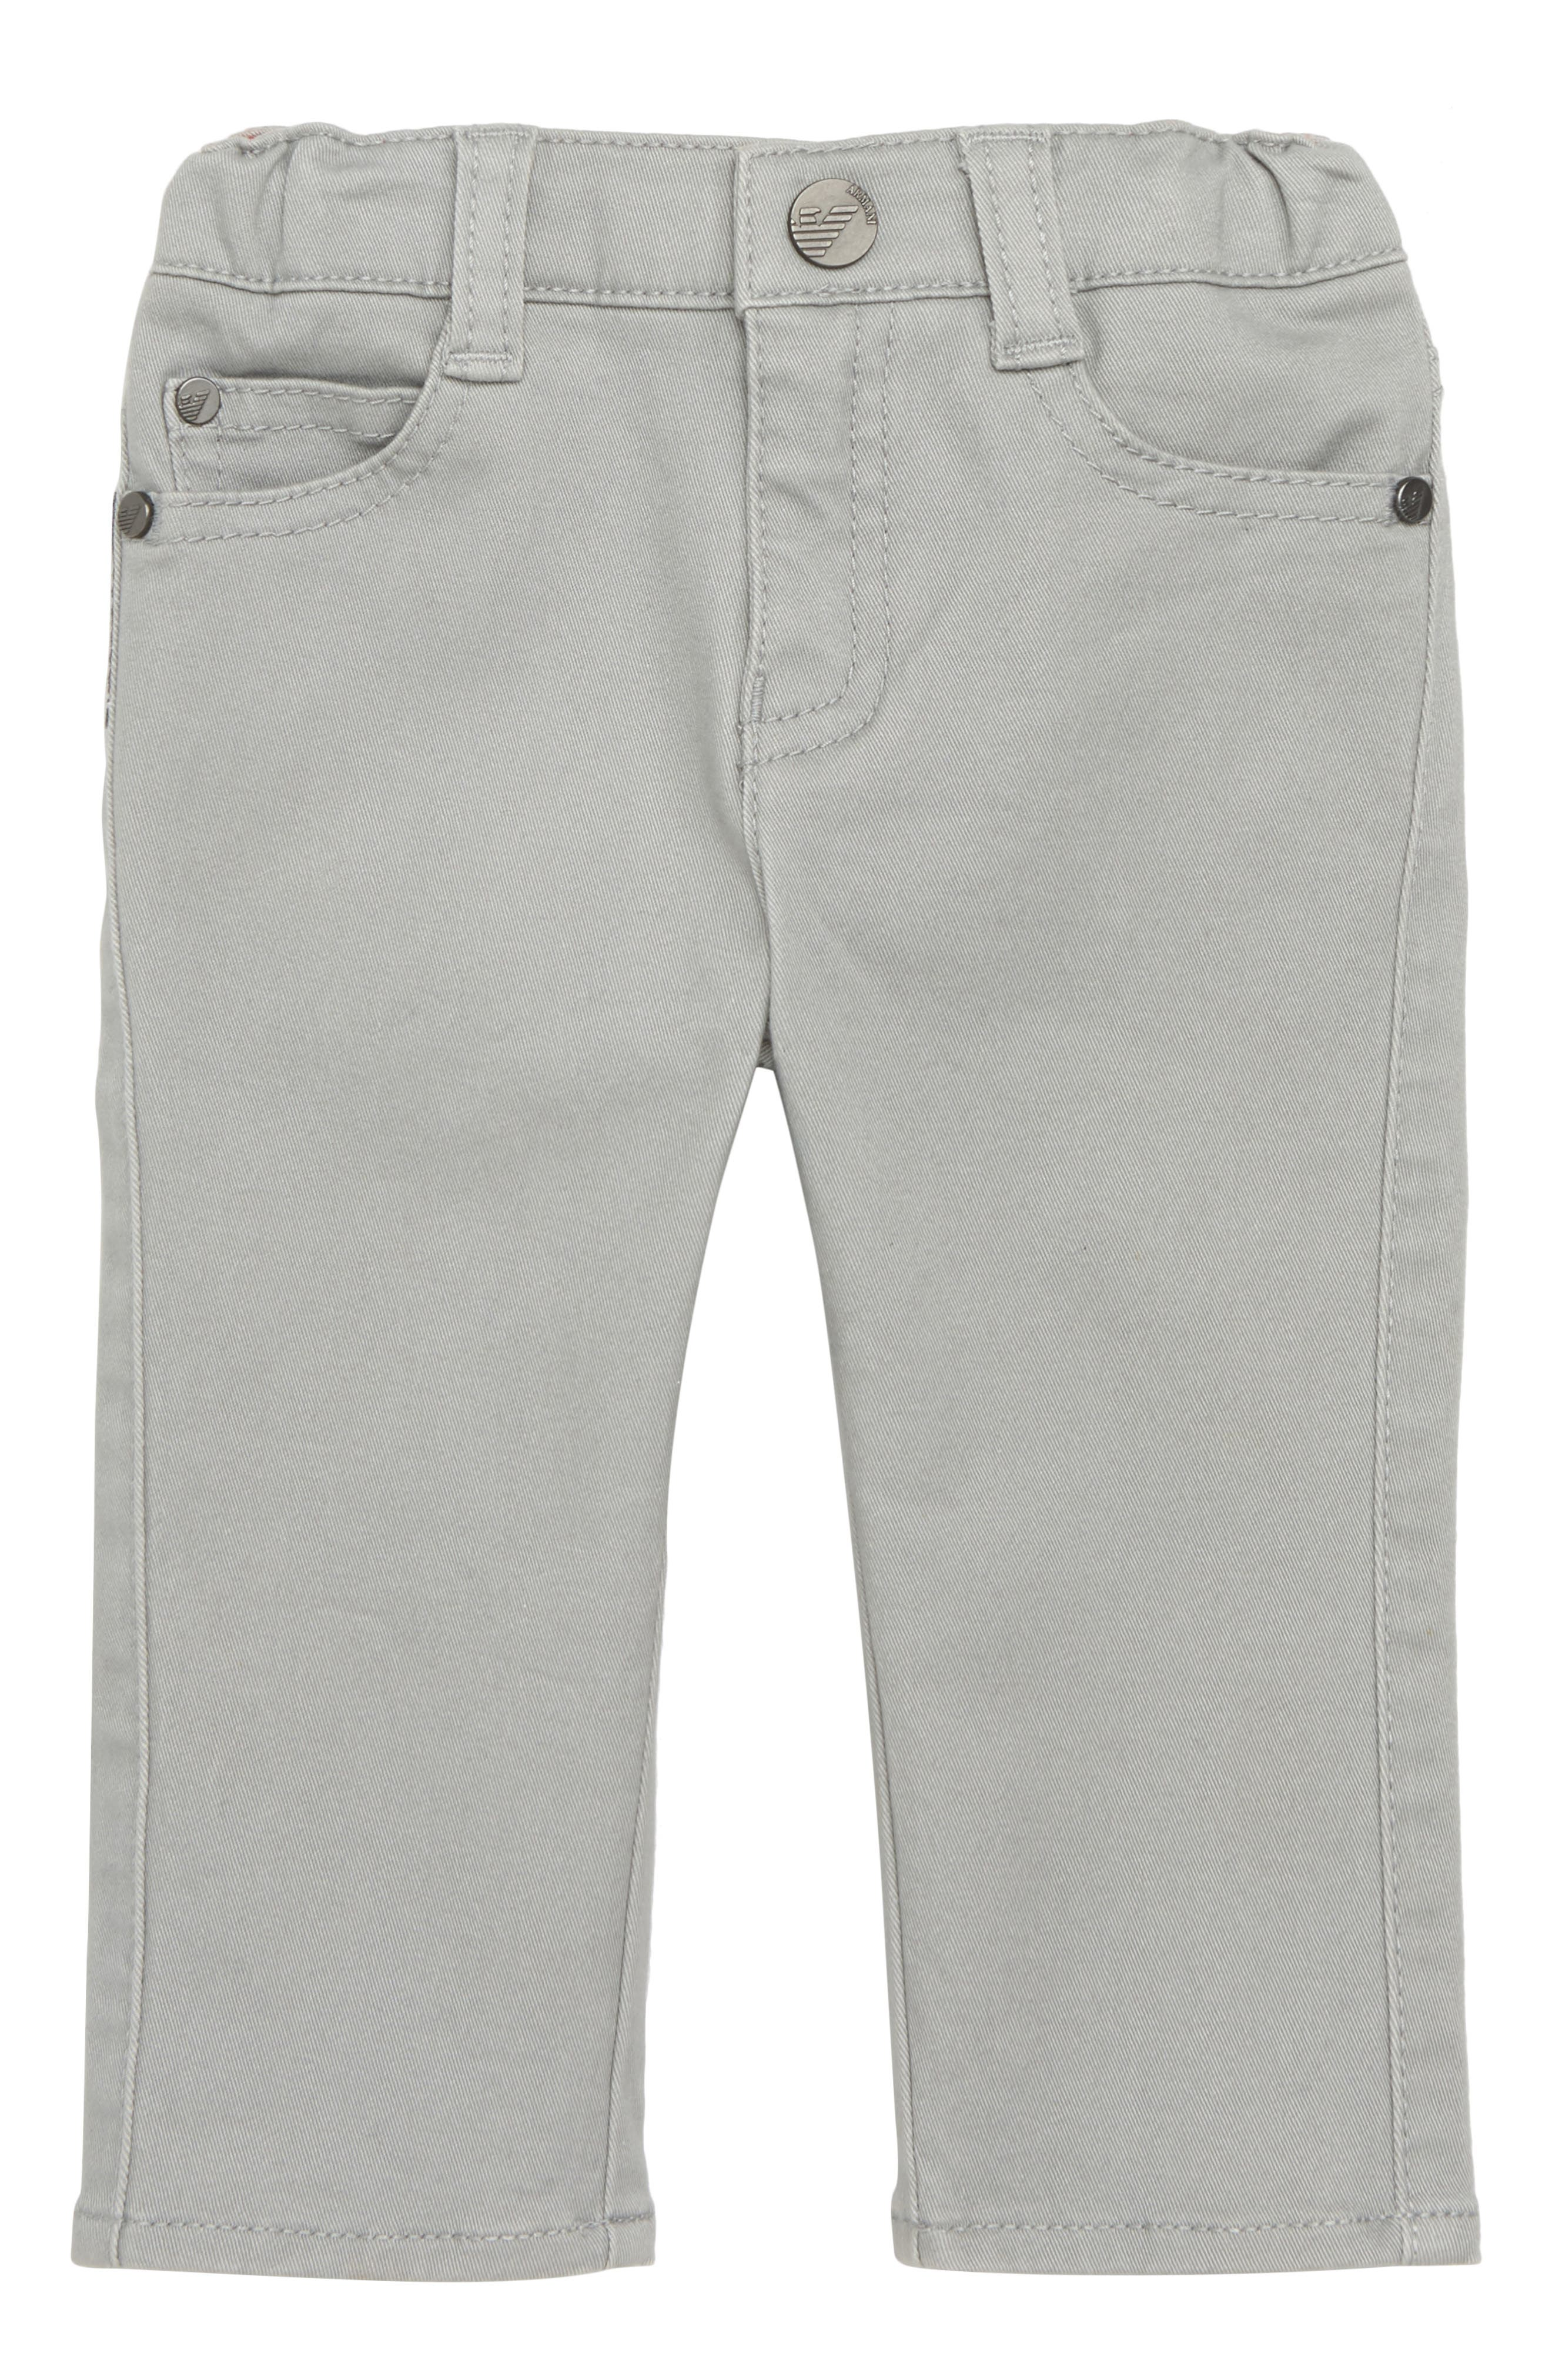 5-Pocket Jeans,                             Main thumbnail 1, color,                             SILVER